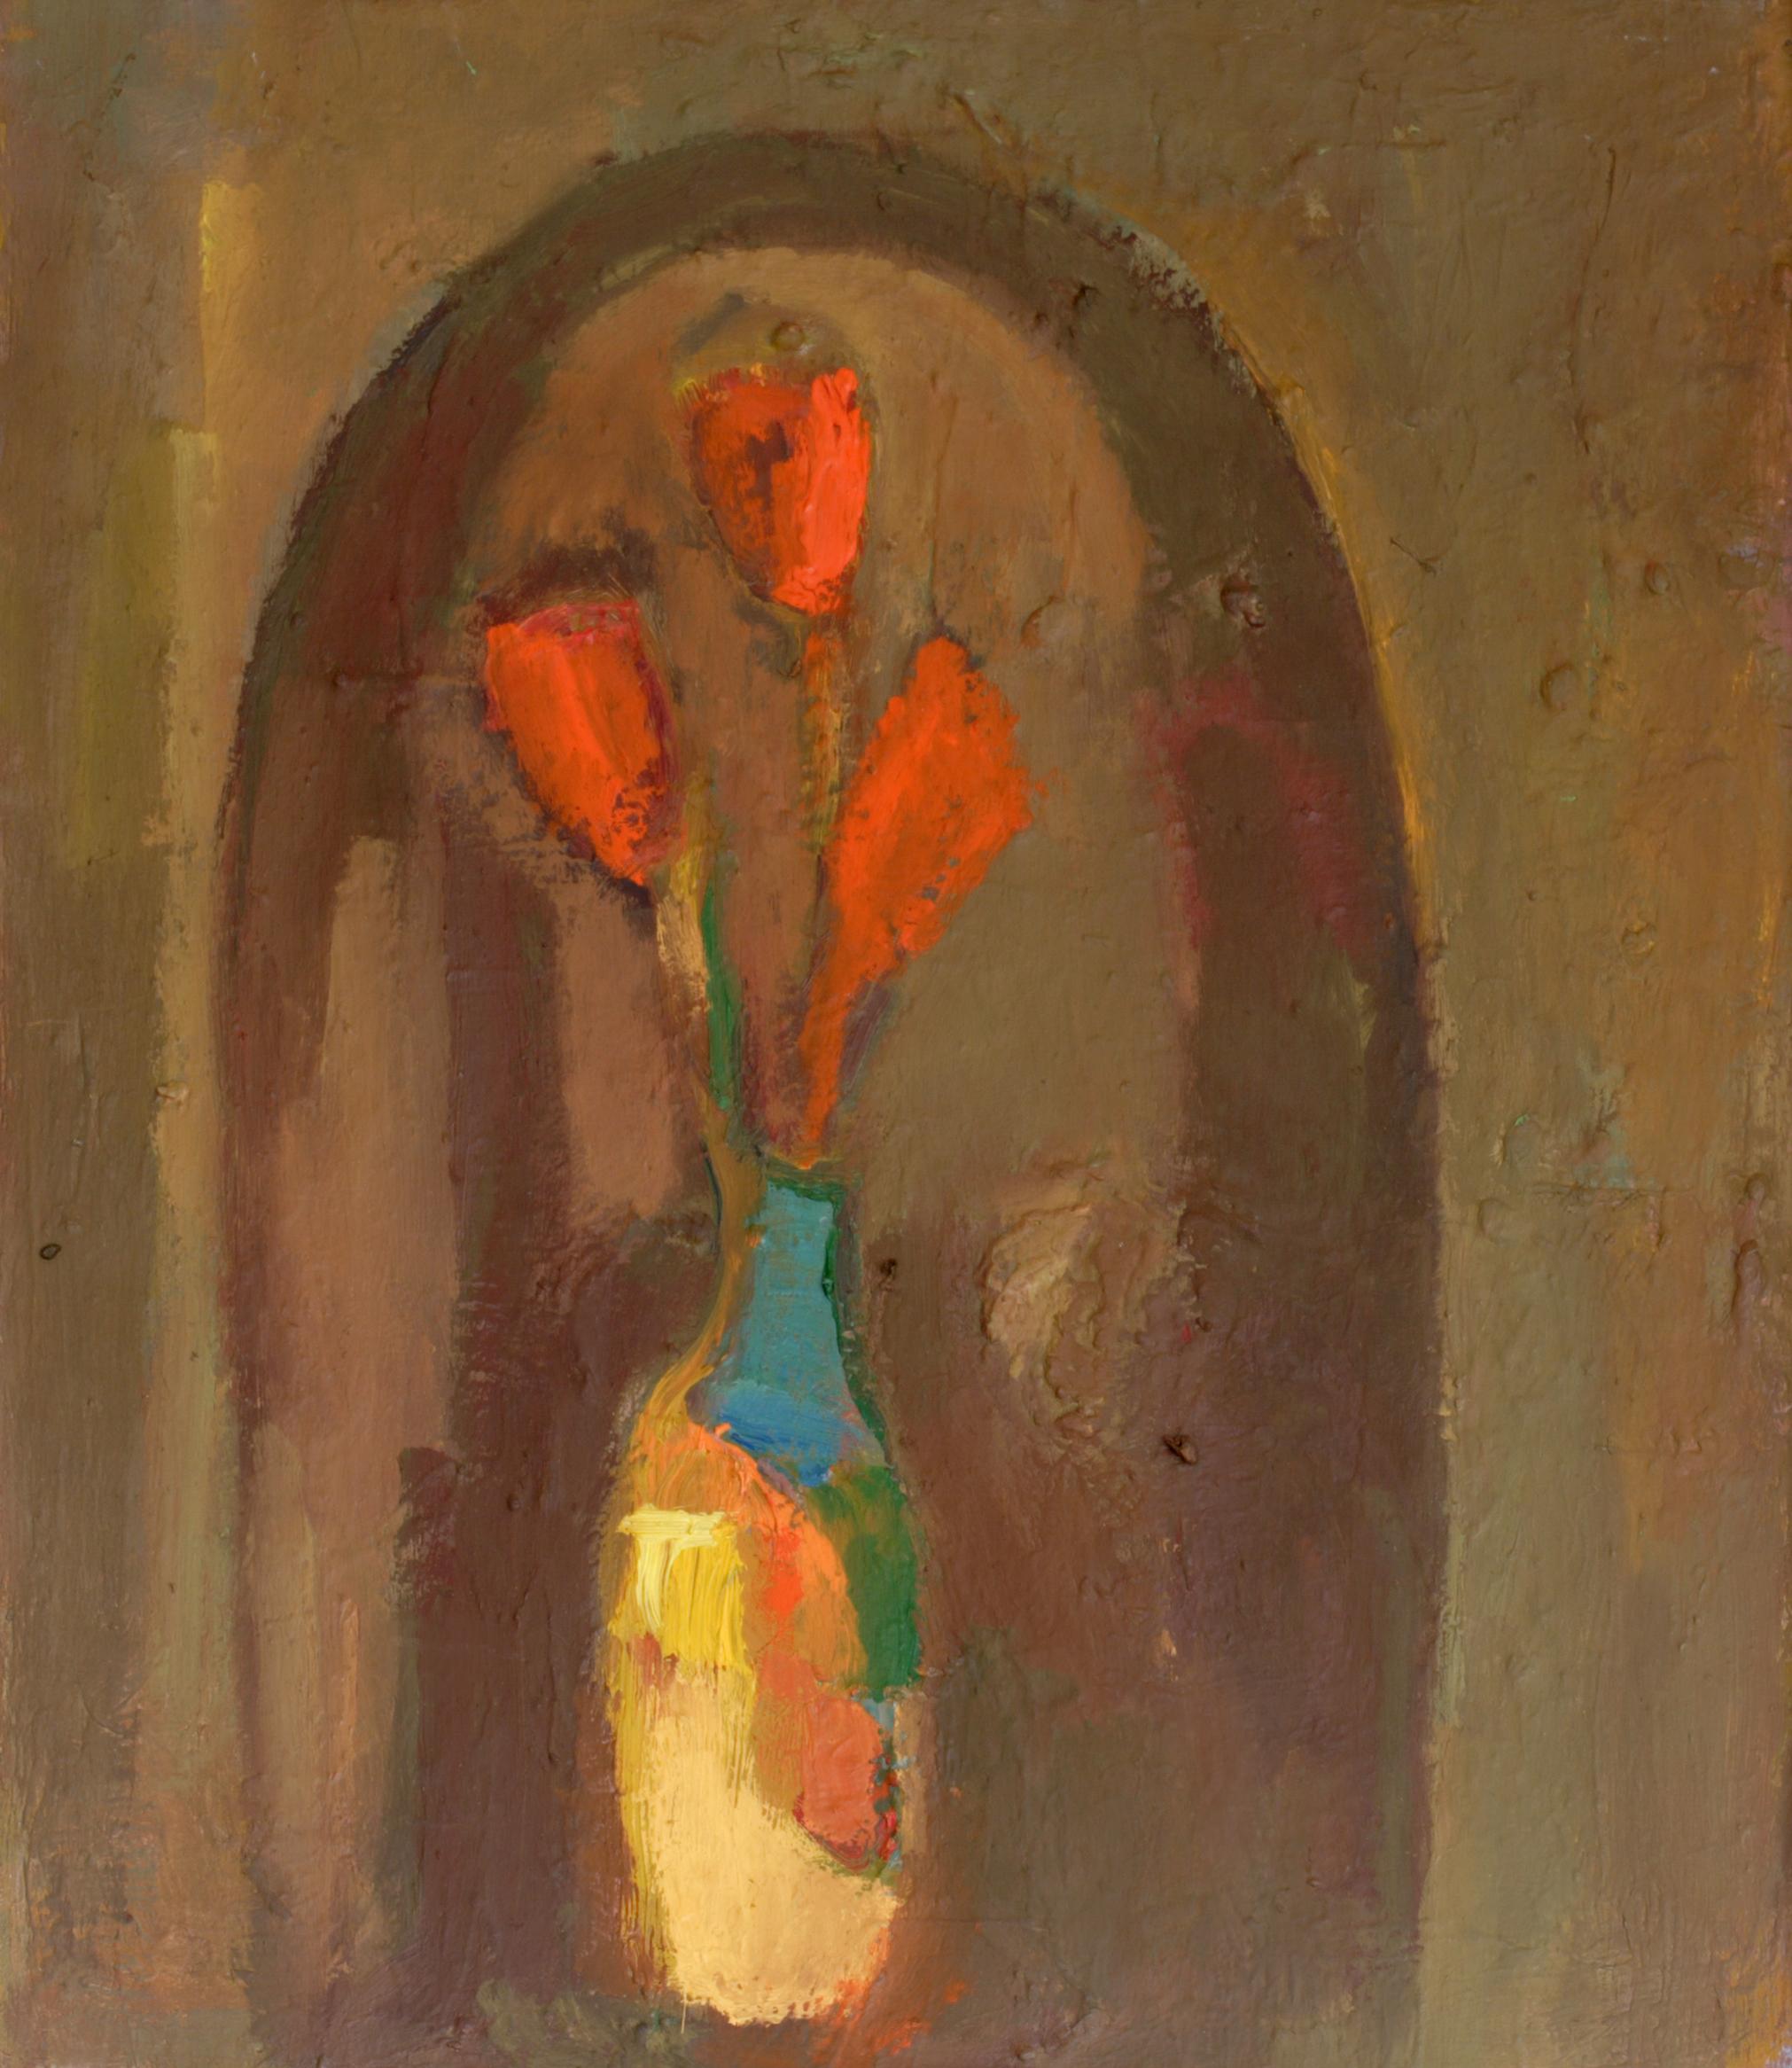 Натюрморт 'Червени цветя' от Олга Белопитова